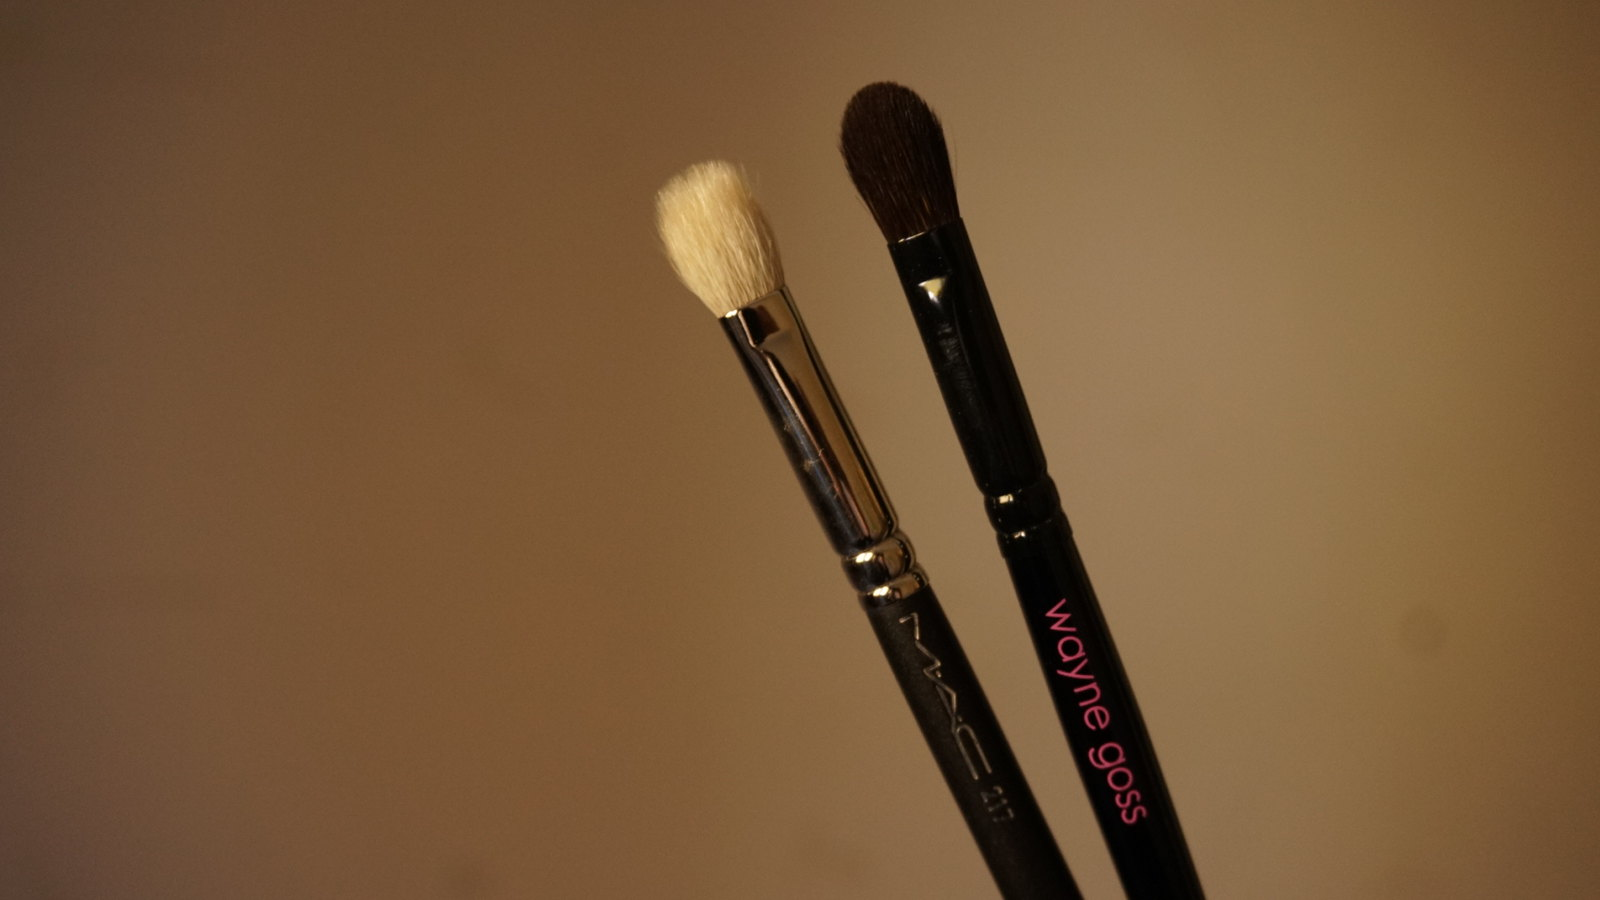 mac 217 brush vs wayne goss brush 06 review girlandvanity.com